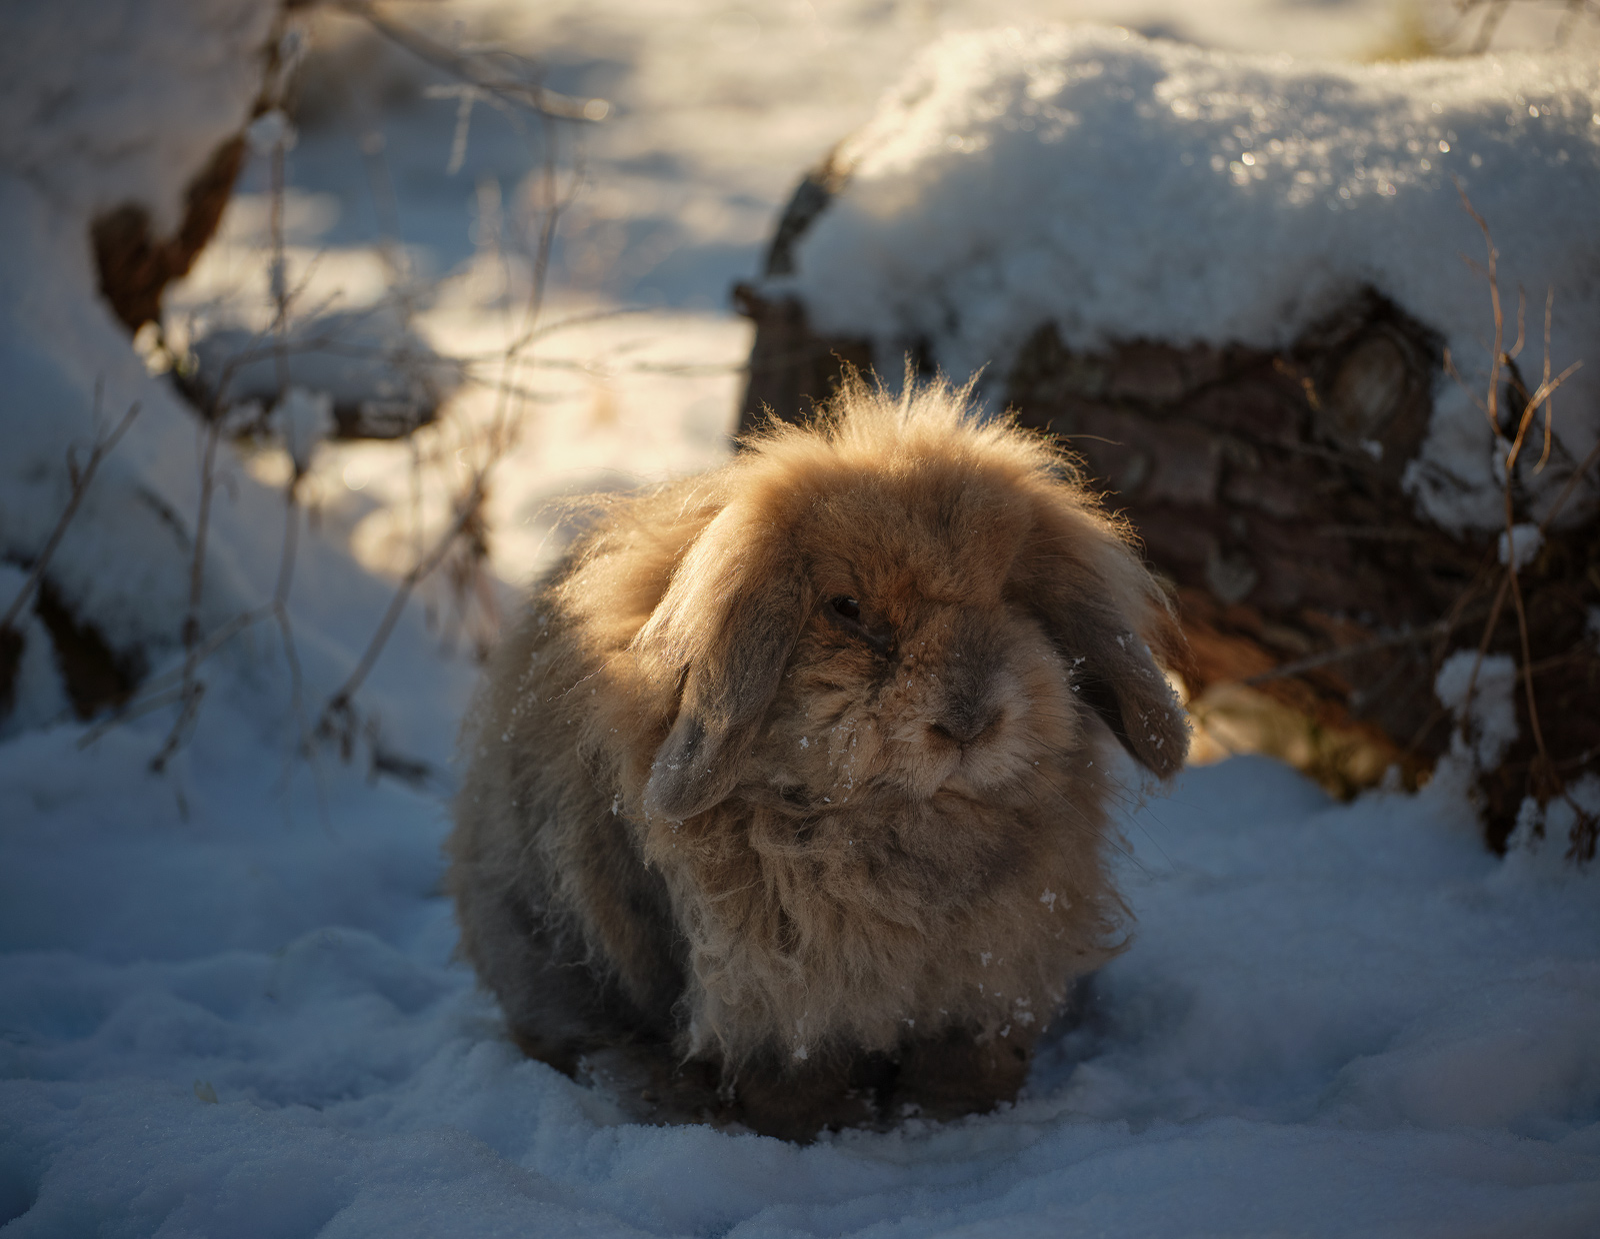 Snow Shoe Toffee, Dallas Dhu, Moray, Scotland, winter, weather, garden, rabbits, snow, fur, backlit, warm, sunshine, whiskesrs...